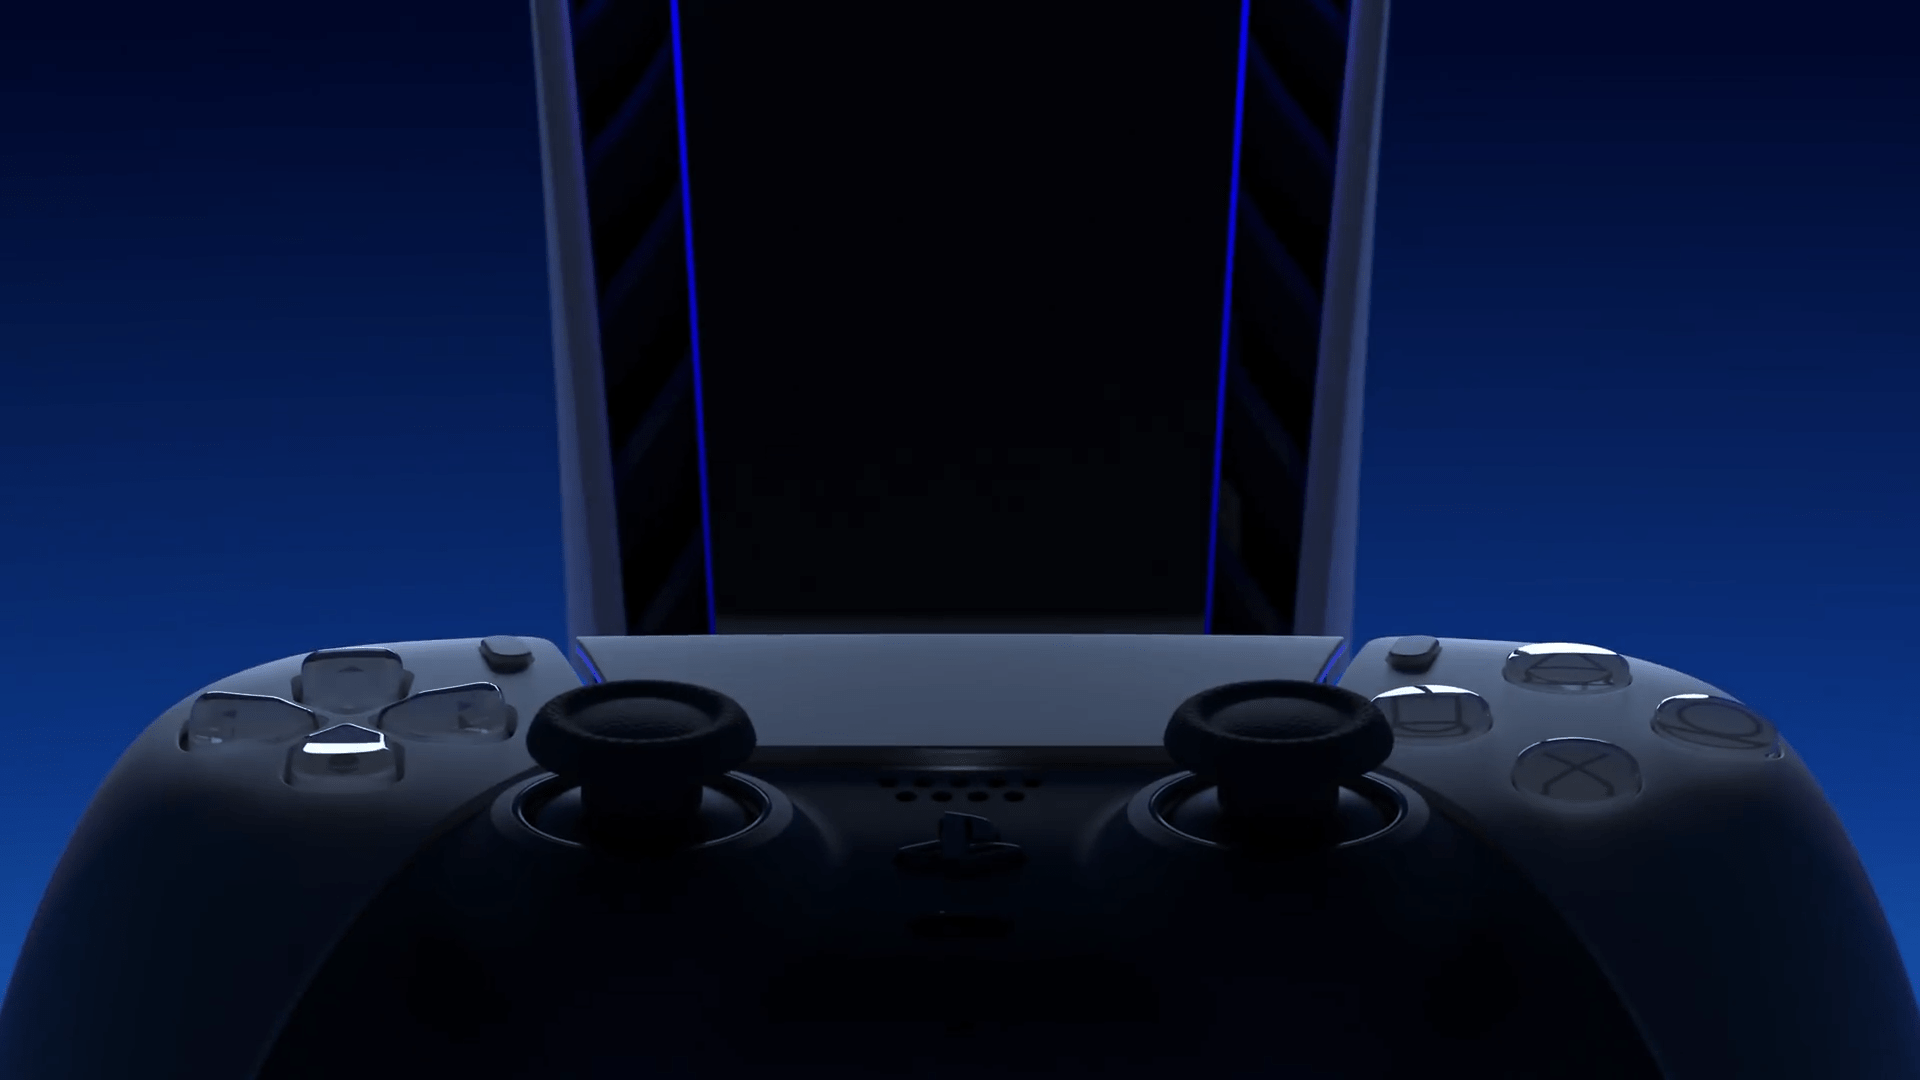 PS5 PlayStation 5 Showcase